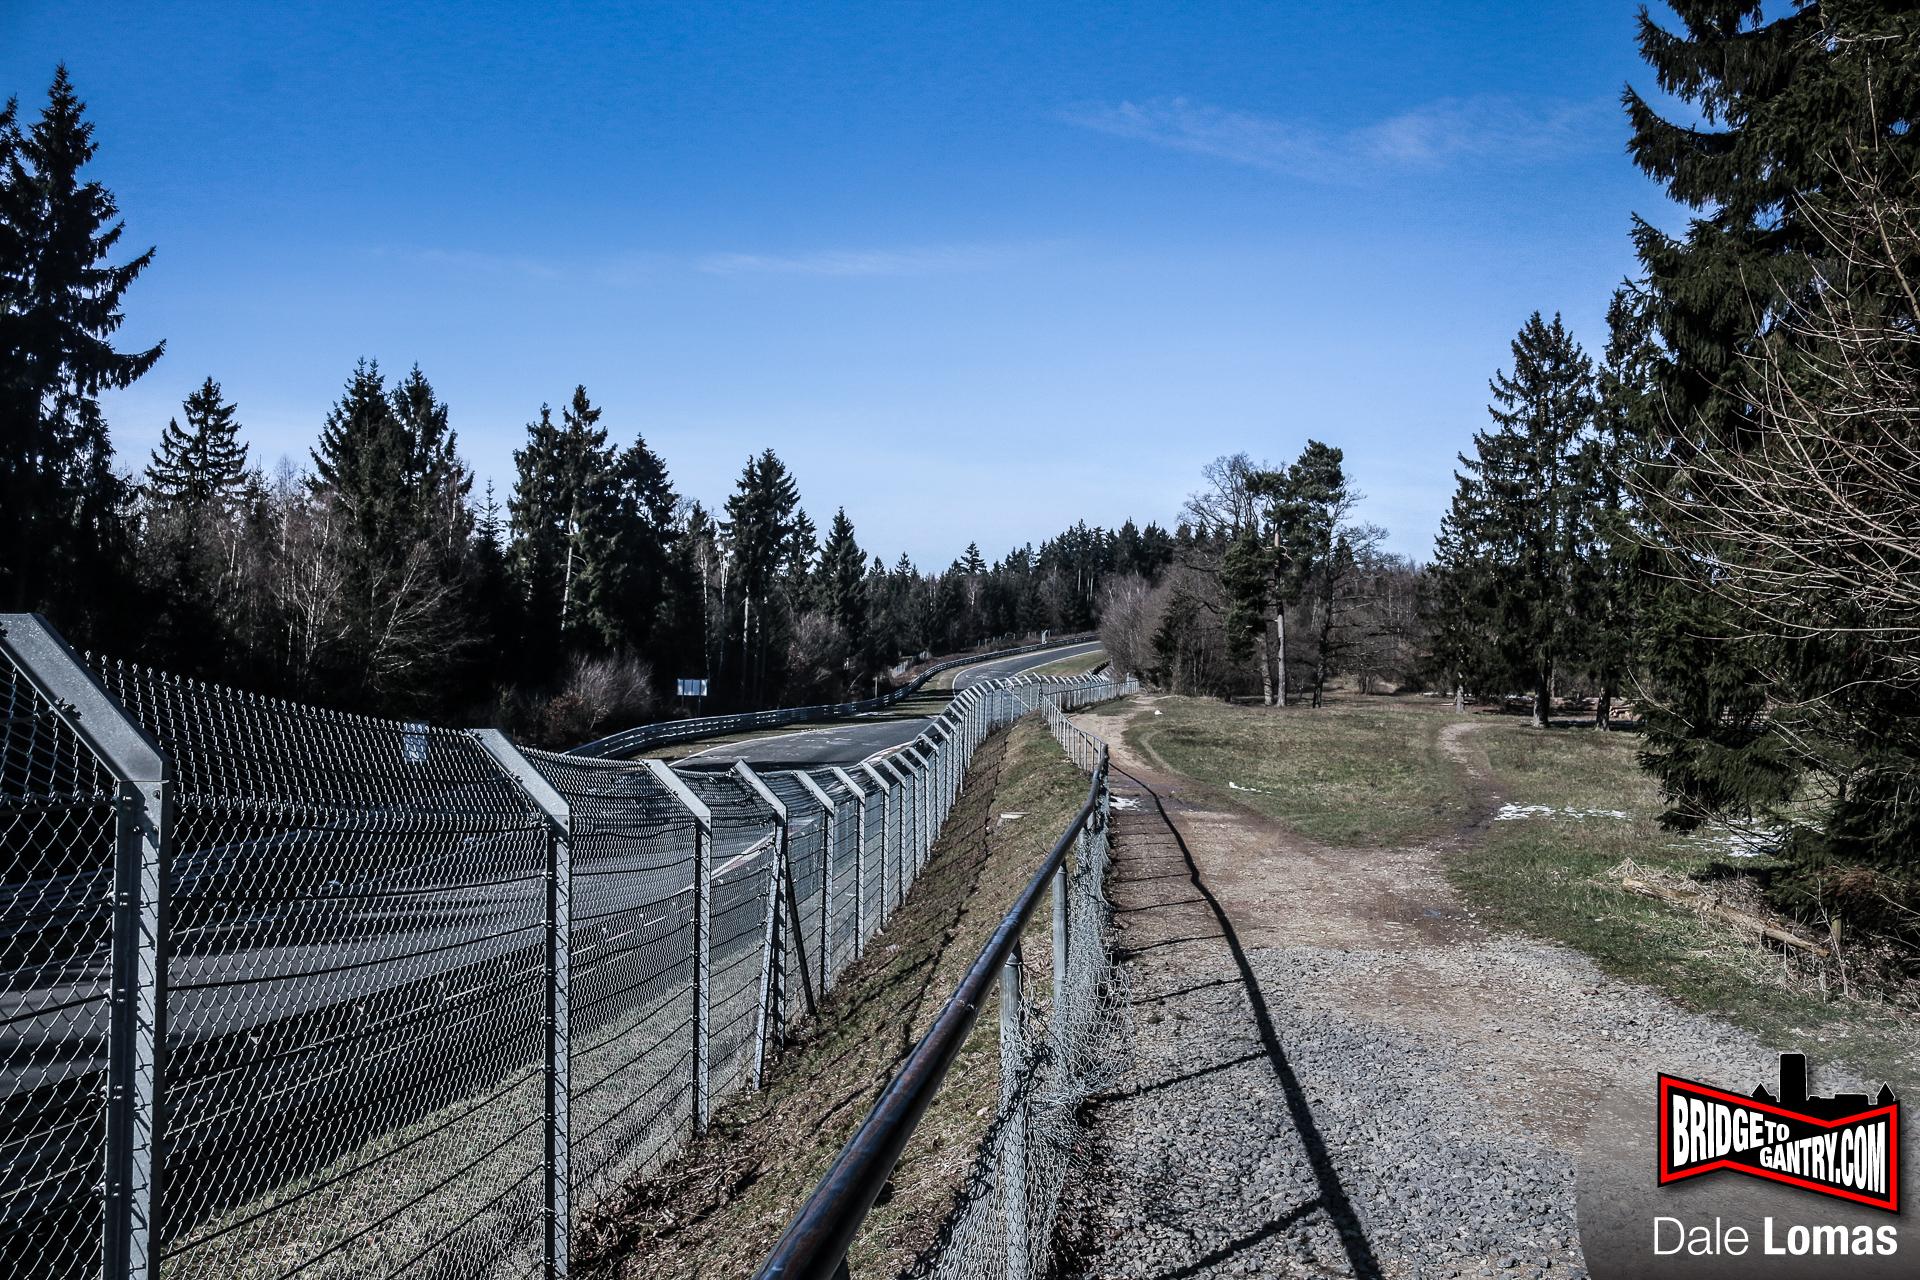 2016 Porsche GT3R testing on the Nürburgring Nordschleife